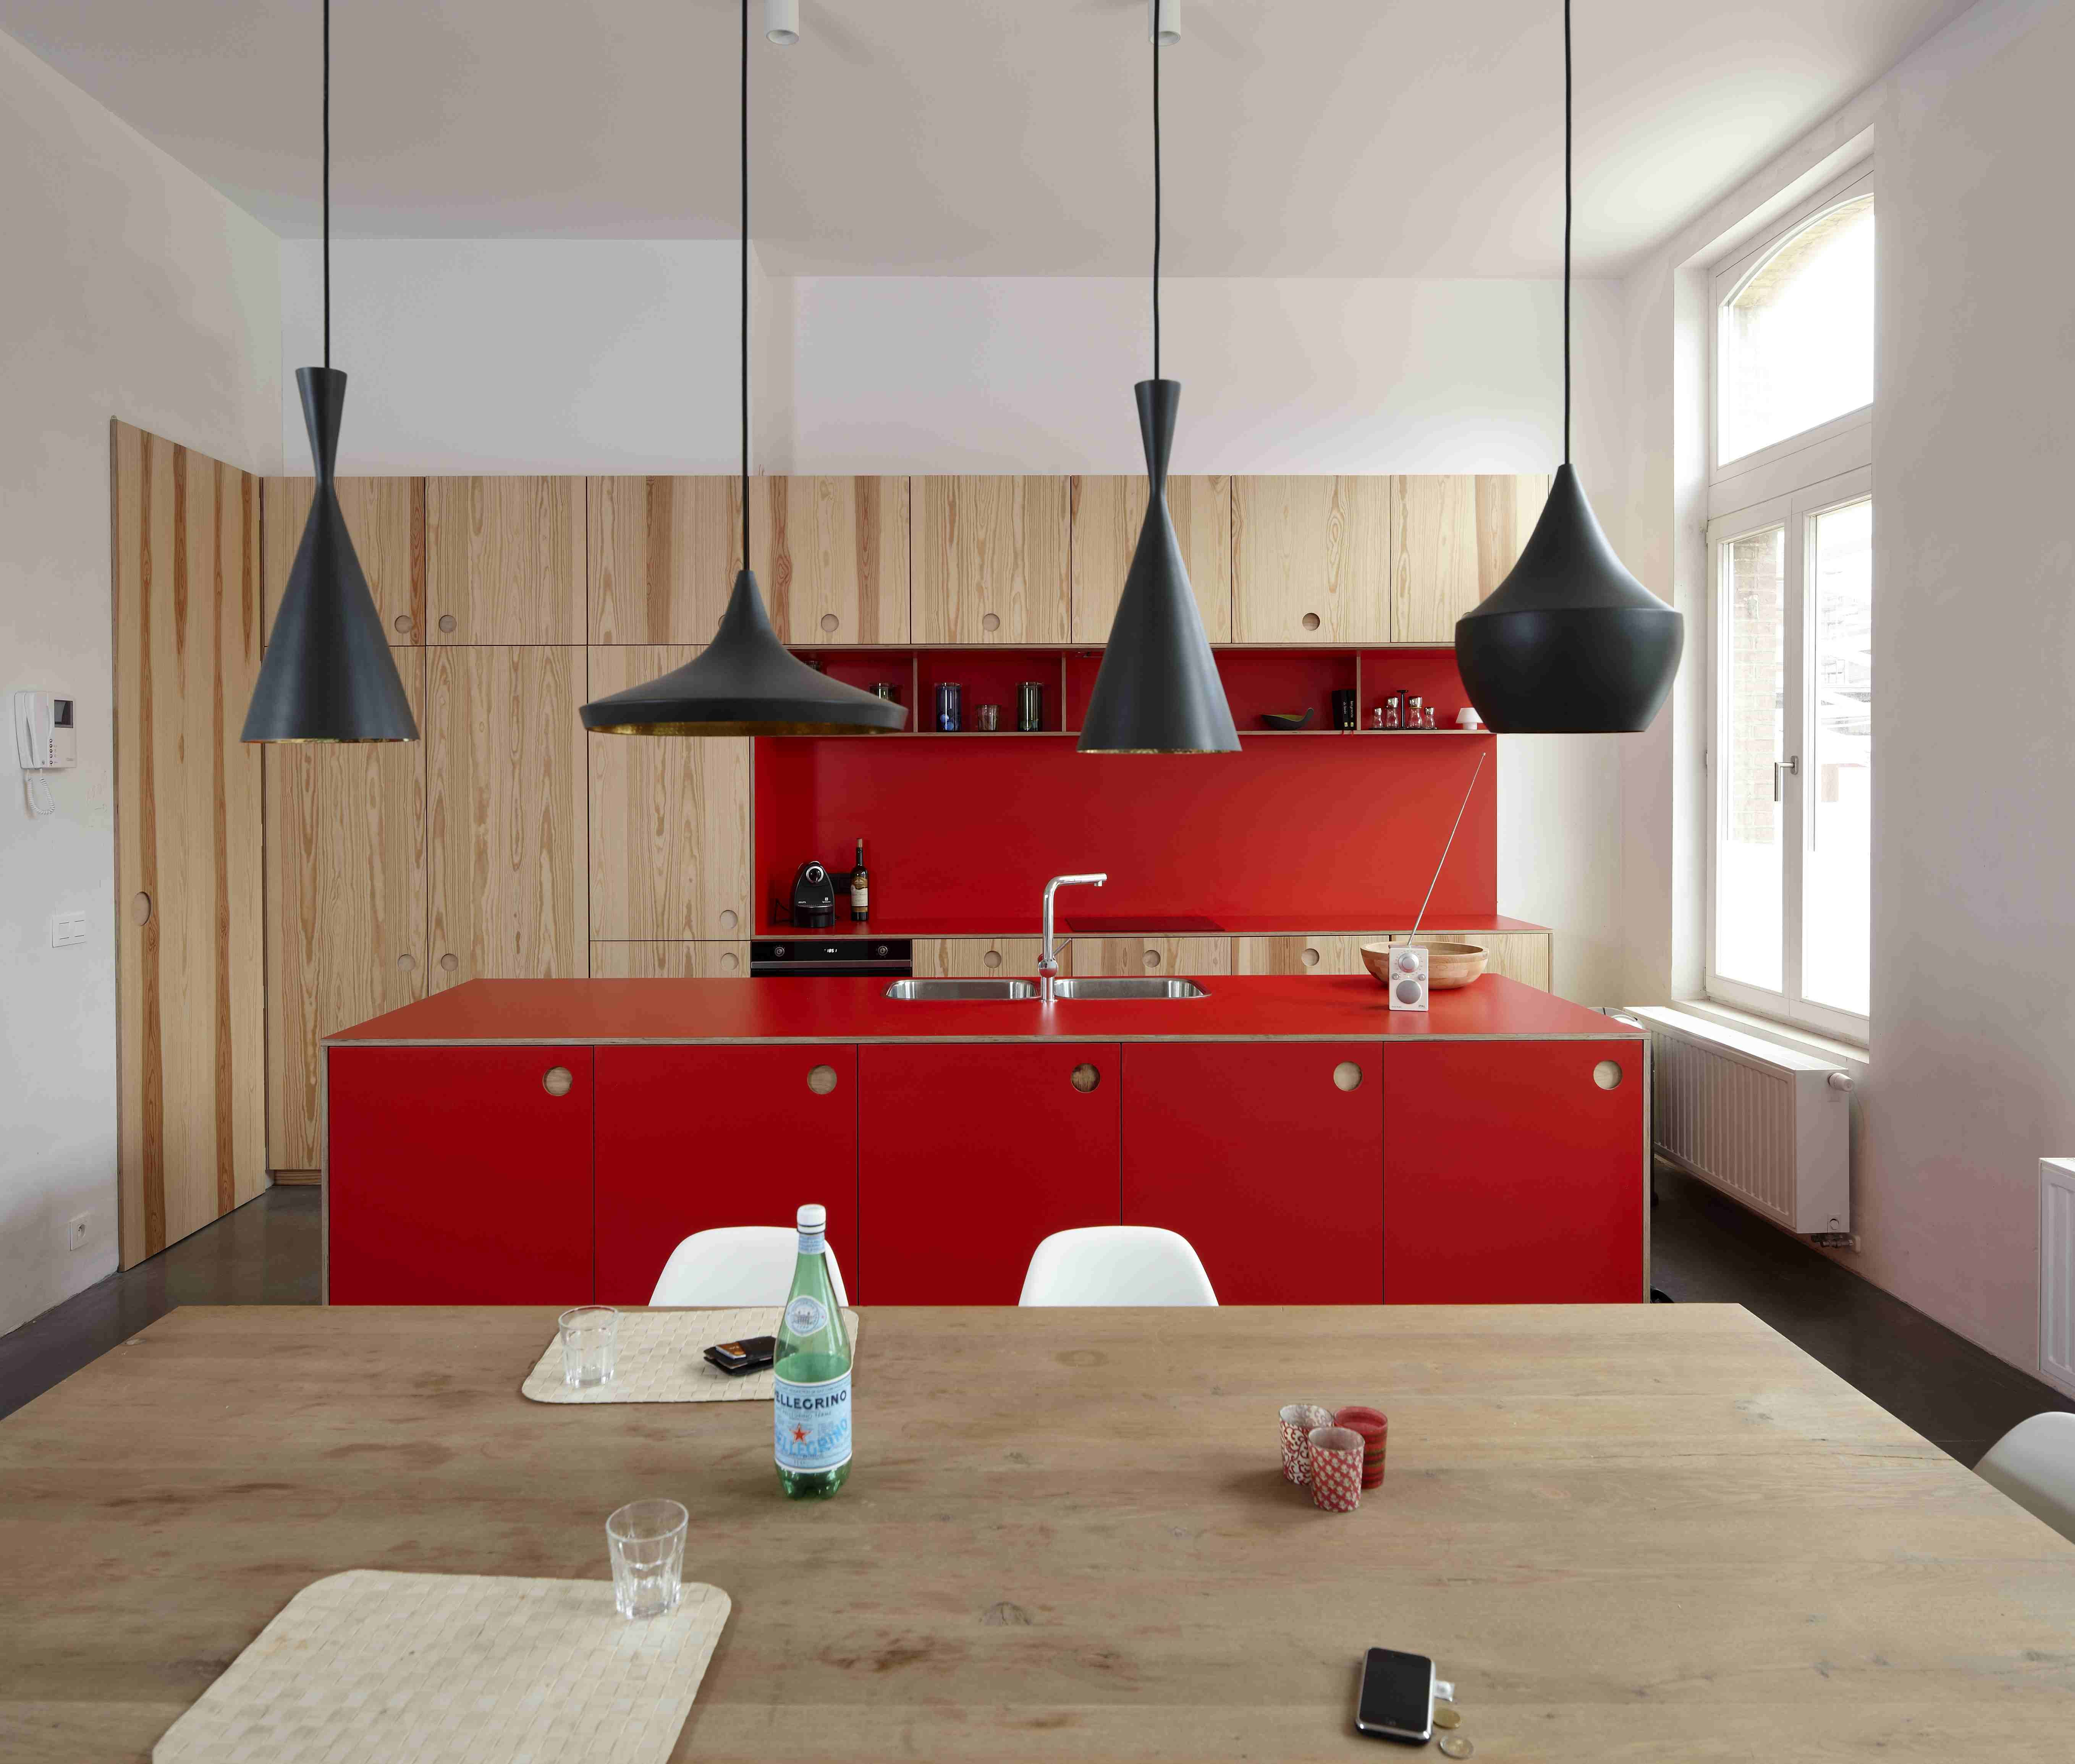 Cucina moderna rossa,rivestimento in legno e lampadari a ...